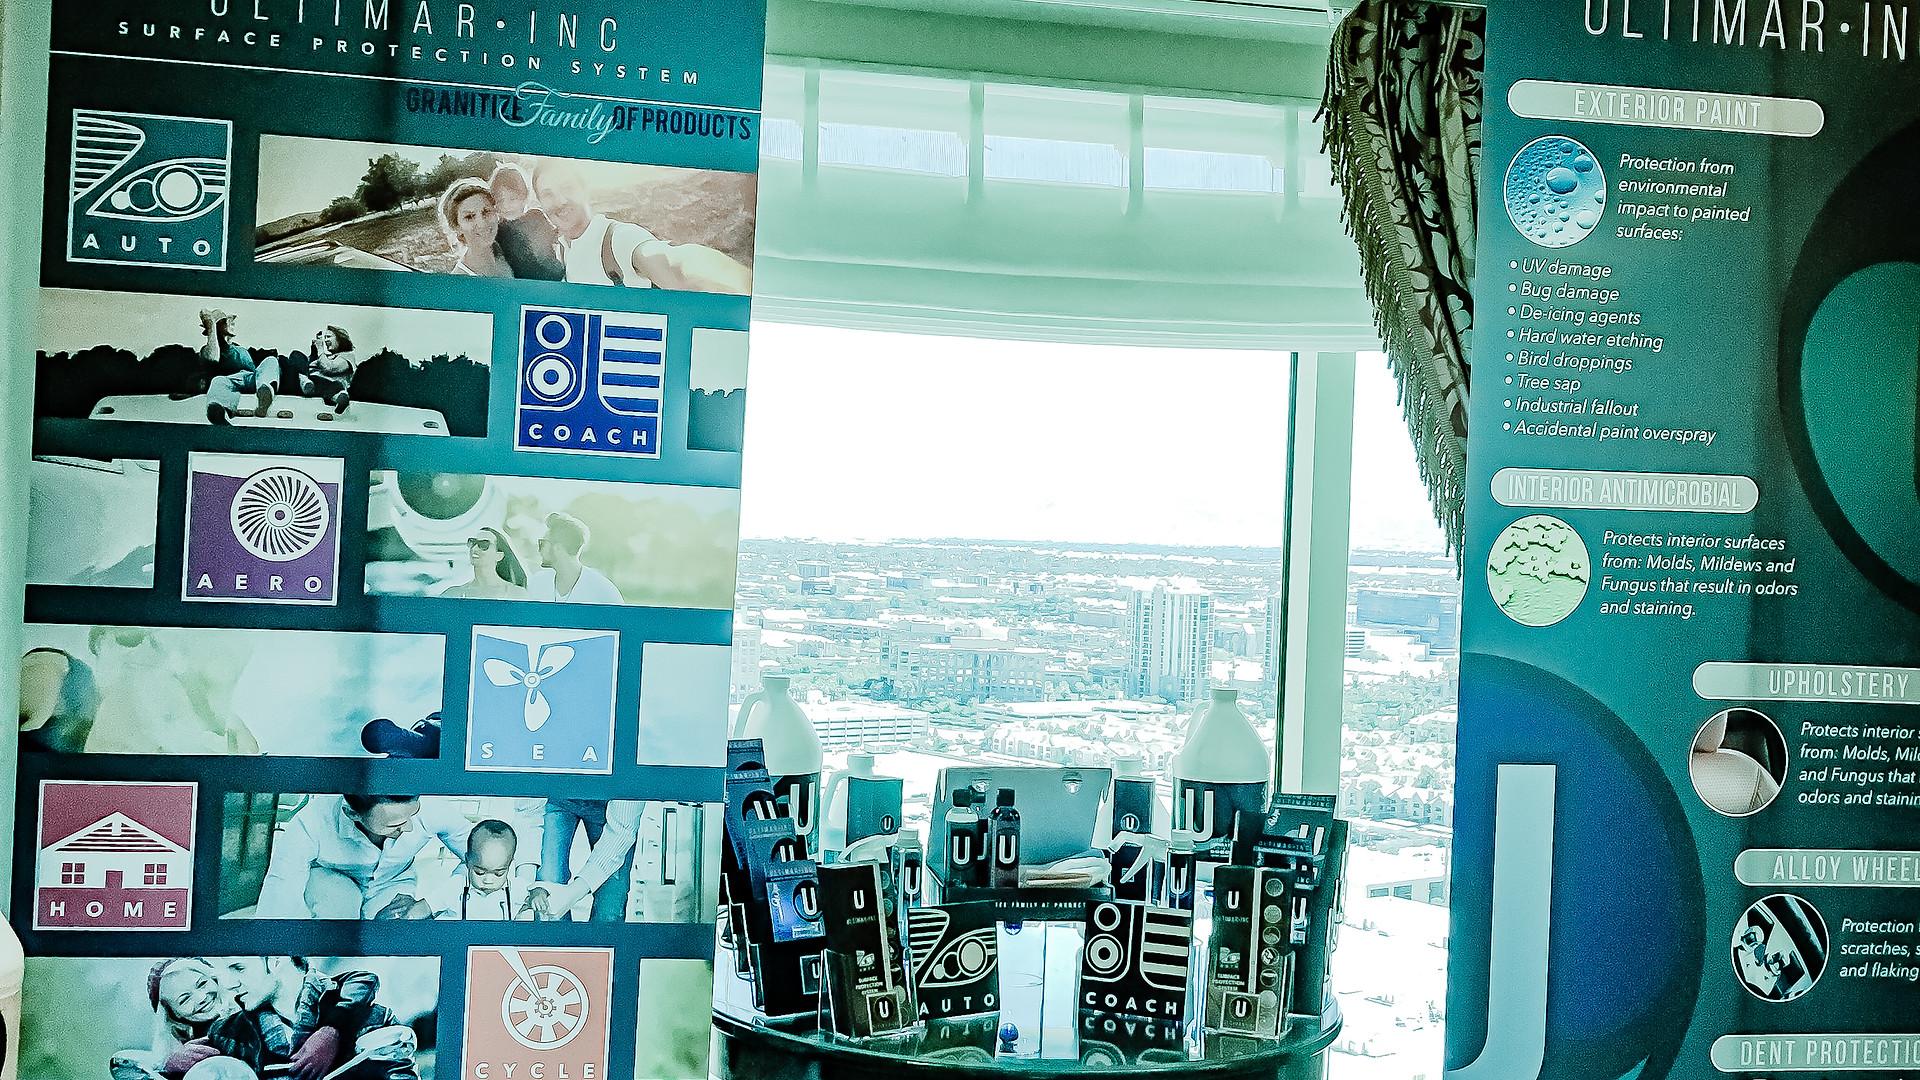 Ultimar Inc - Trade Show Private Suite